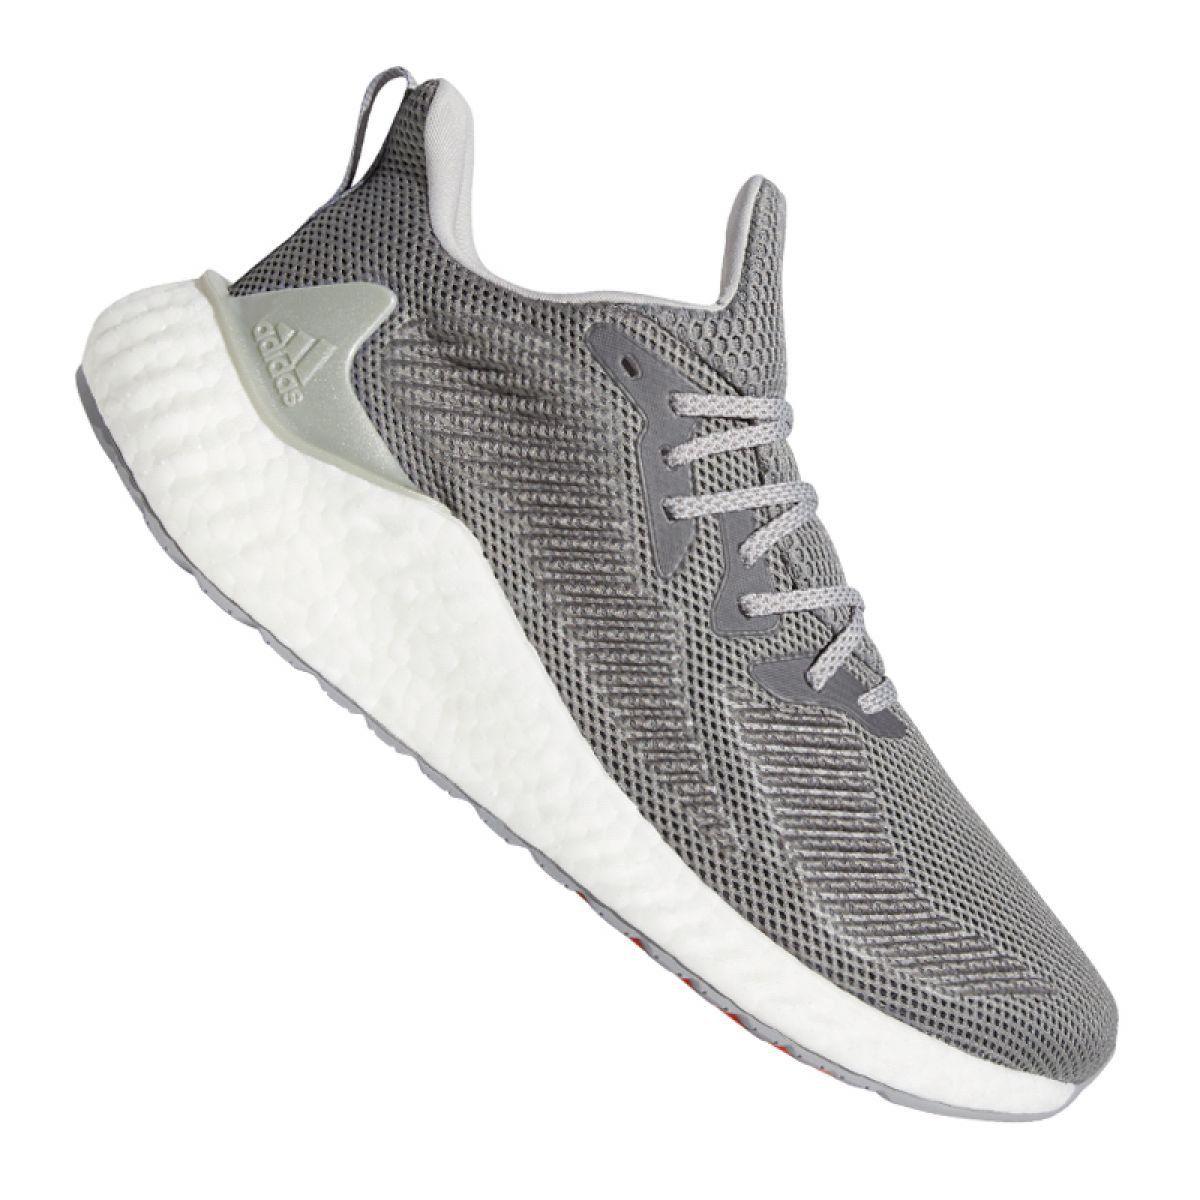 Buty Biegowe Adidas Alphaboost M G54129 Szare Adidas Running Shoes Saucony Running Shoes Running Shoes For Men